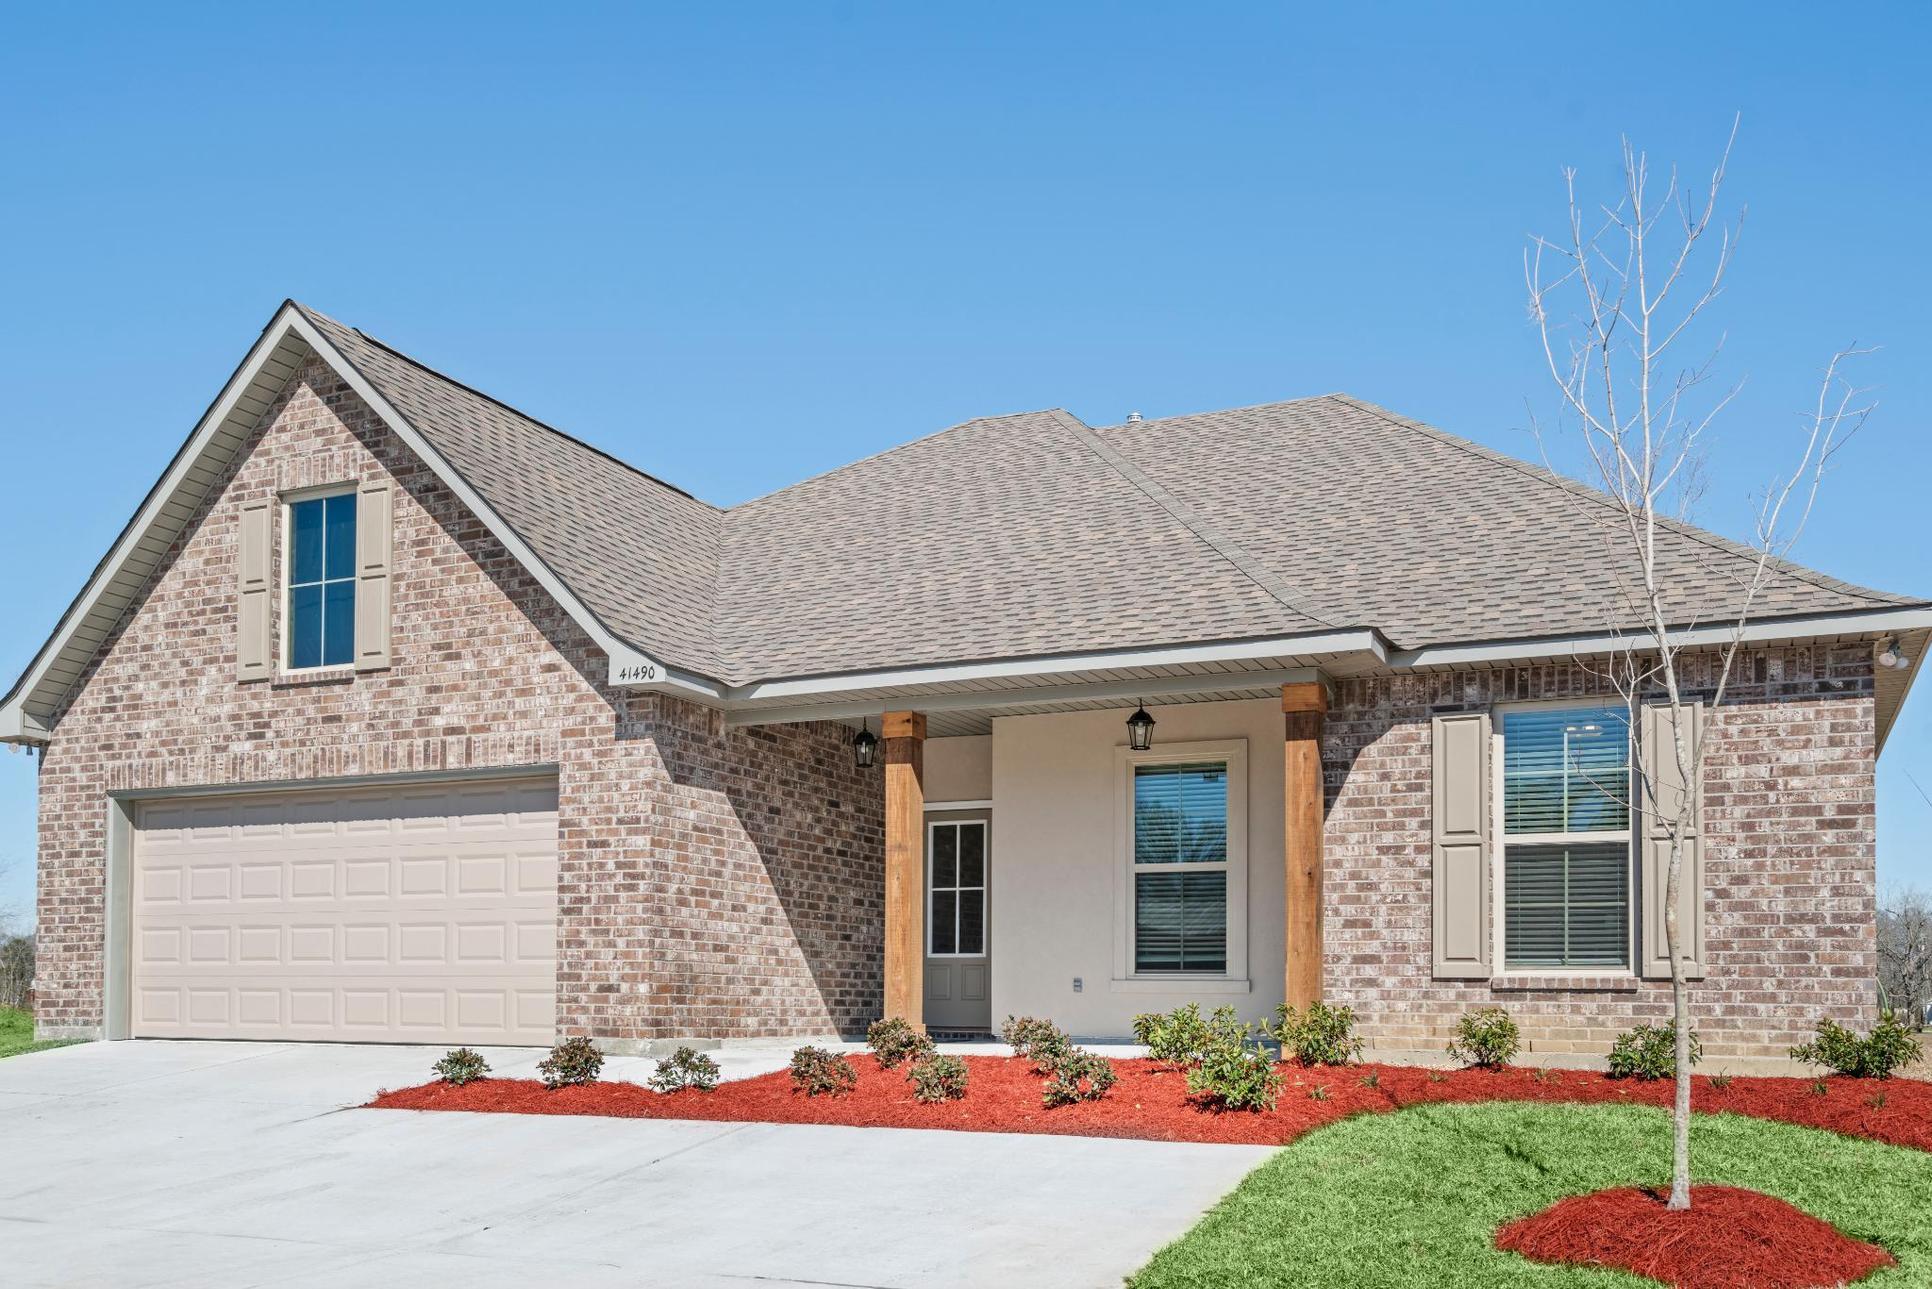 new homes in prarieville, la in cottages at savannah row:Cottages at Savannah Row- Model Home Exterior - DSLD Homes